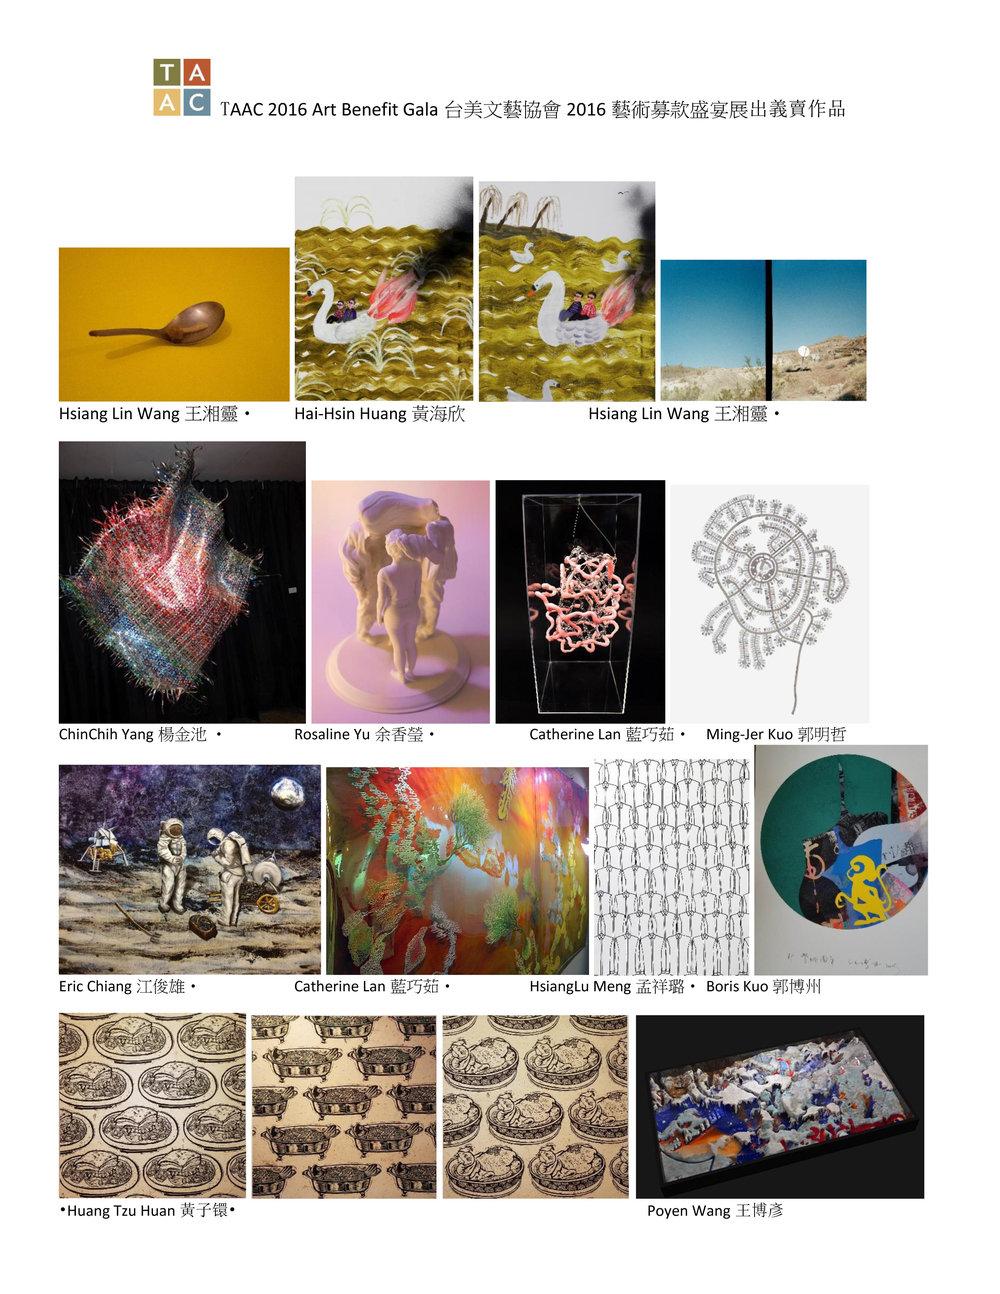 PDF 2016藝術募款盛宴展出義賣作品AAC 2016 Art Benefit Gala1.jpg